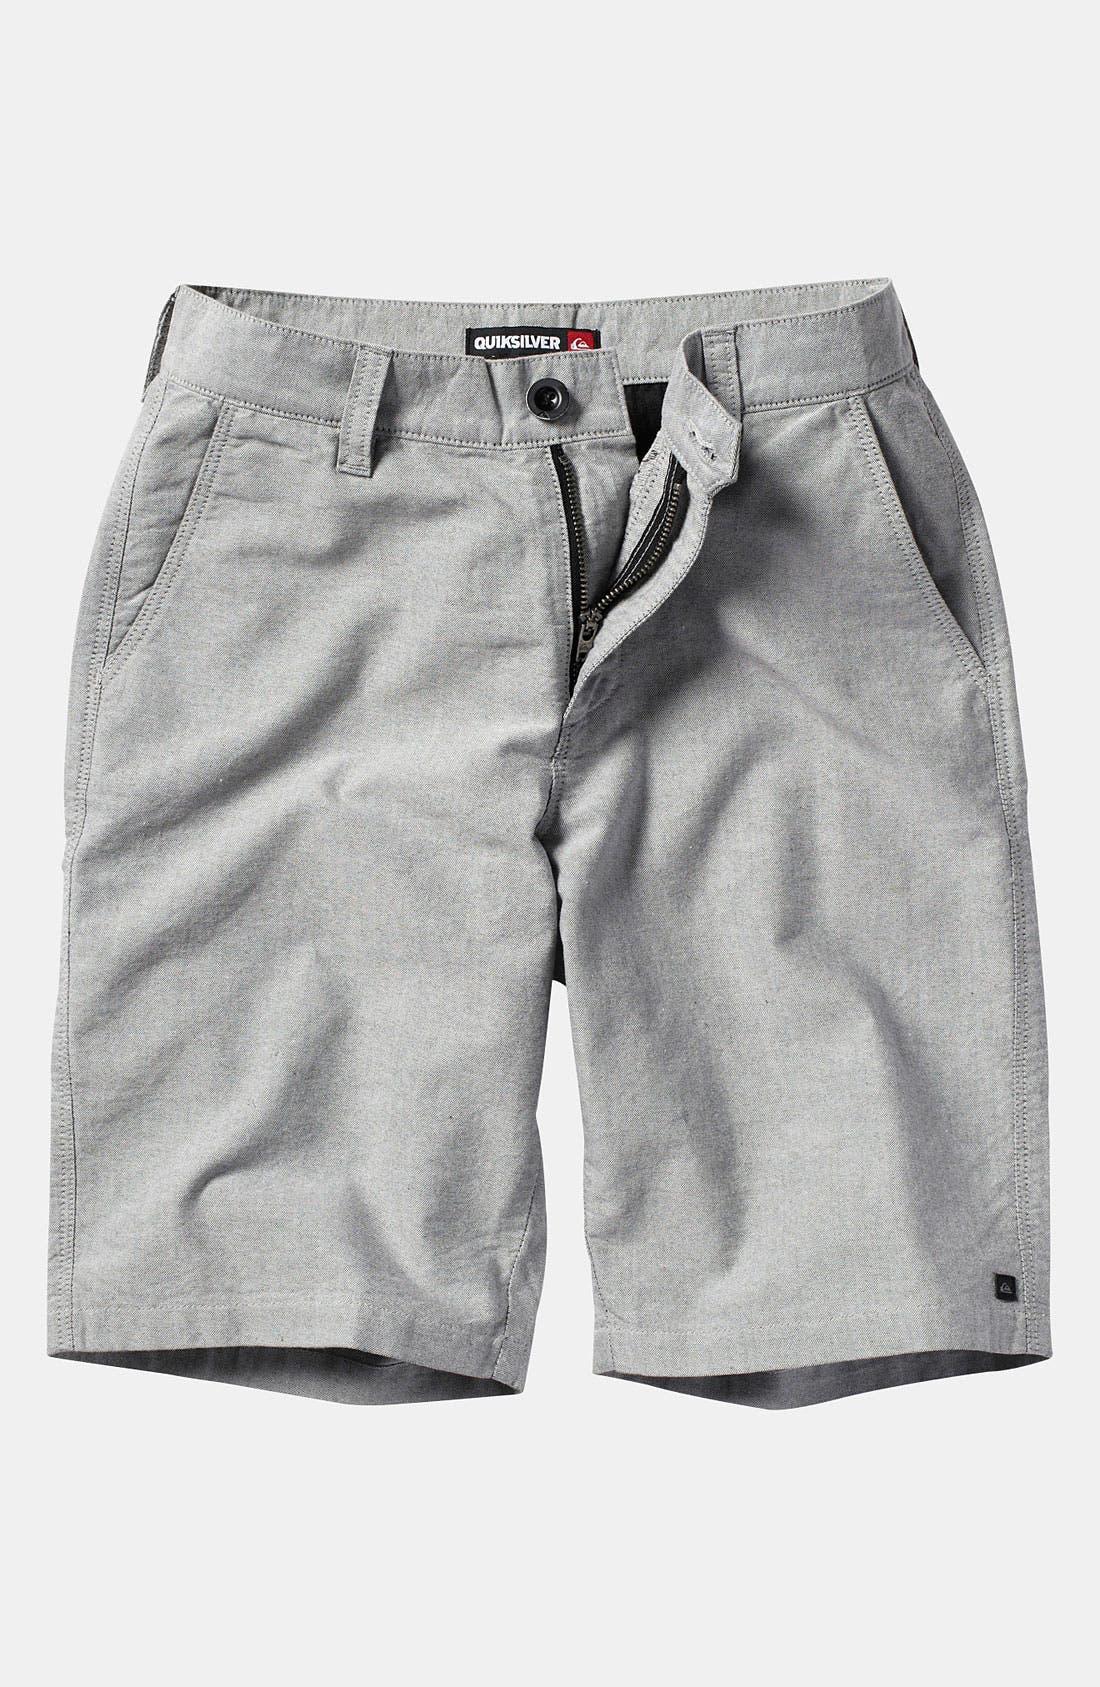 Alternate Image 1 Selected - Quiksilver 'Thurston' Chambray Shorts (Big Boys)